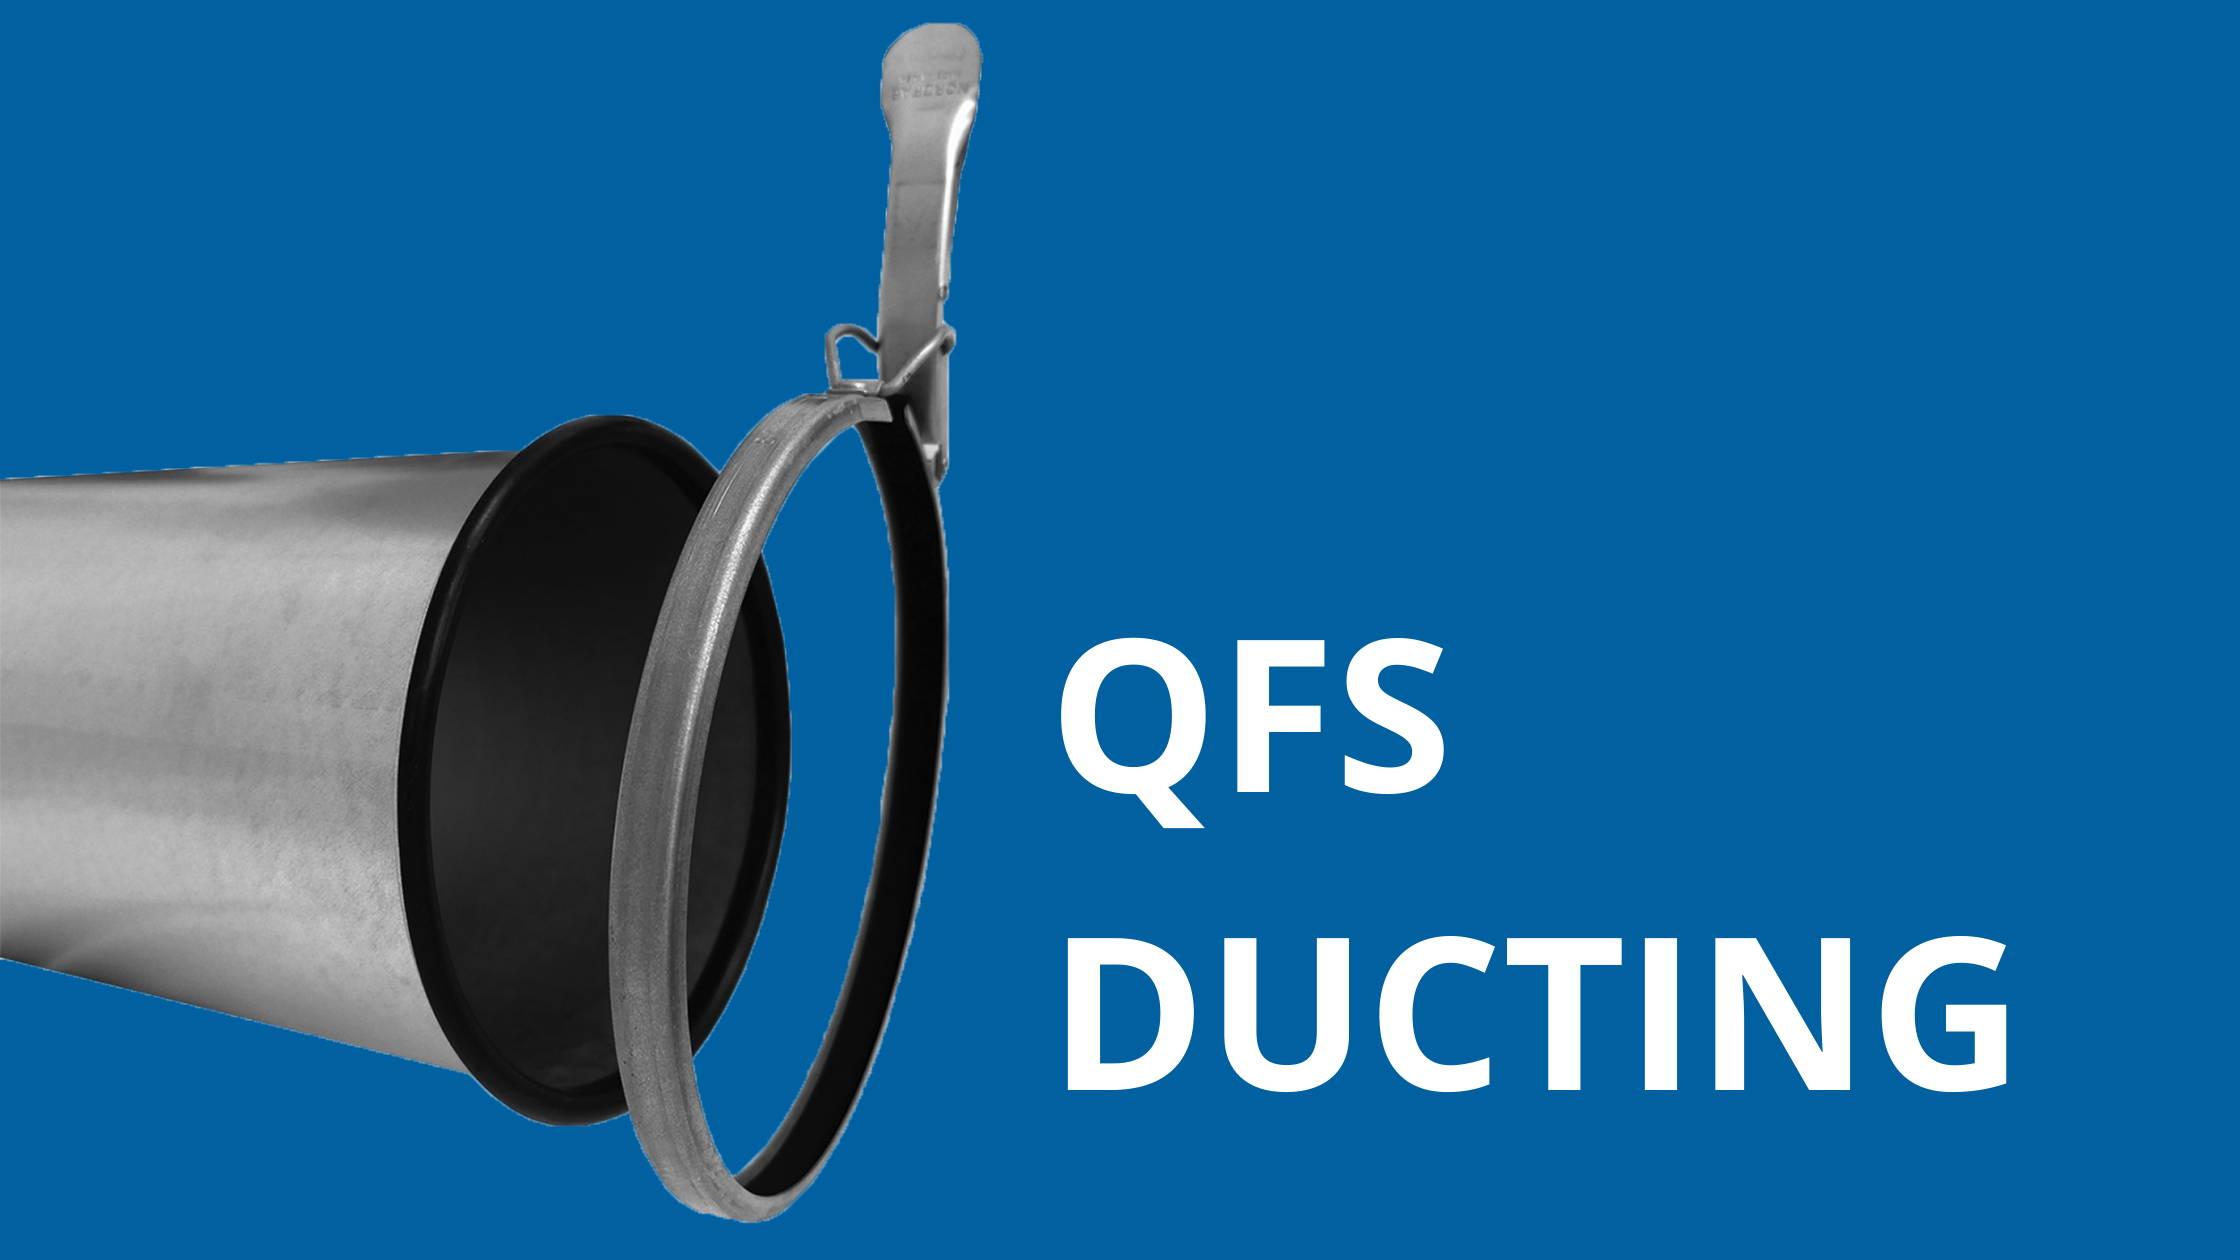 Nordfab QFS Ducting